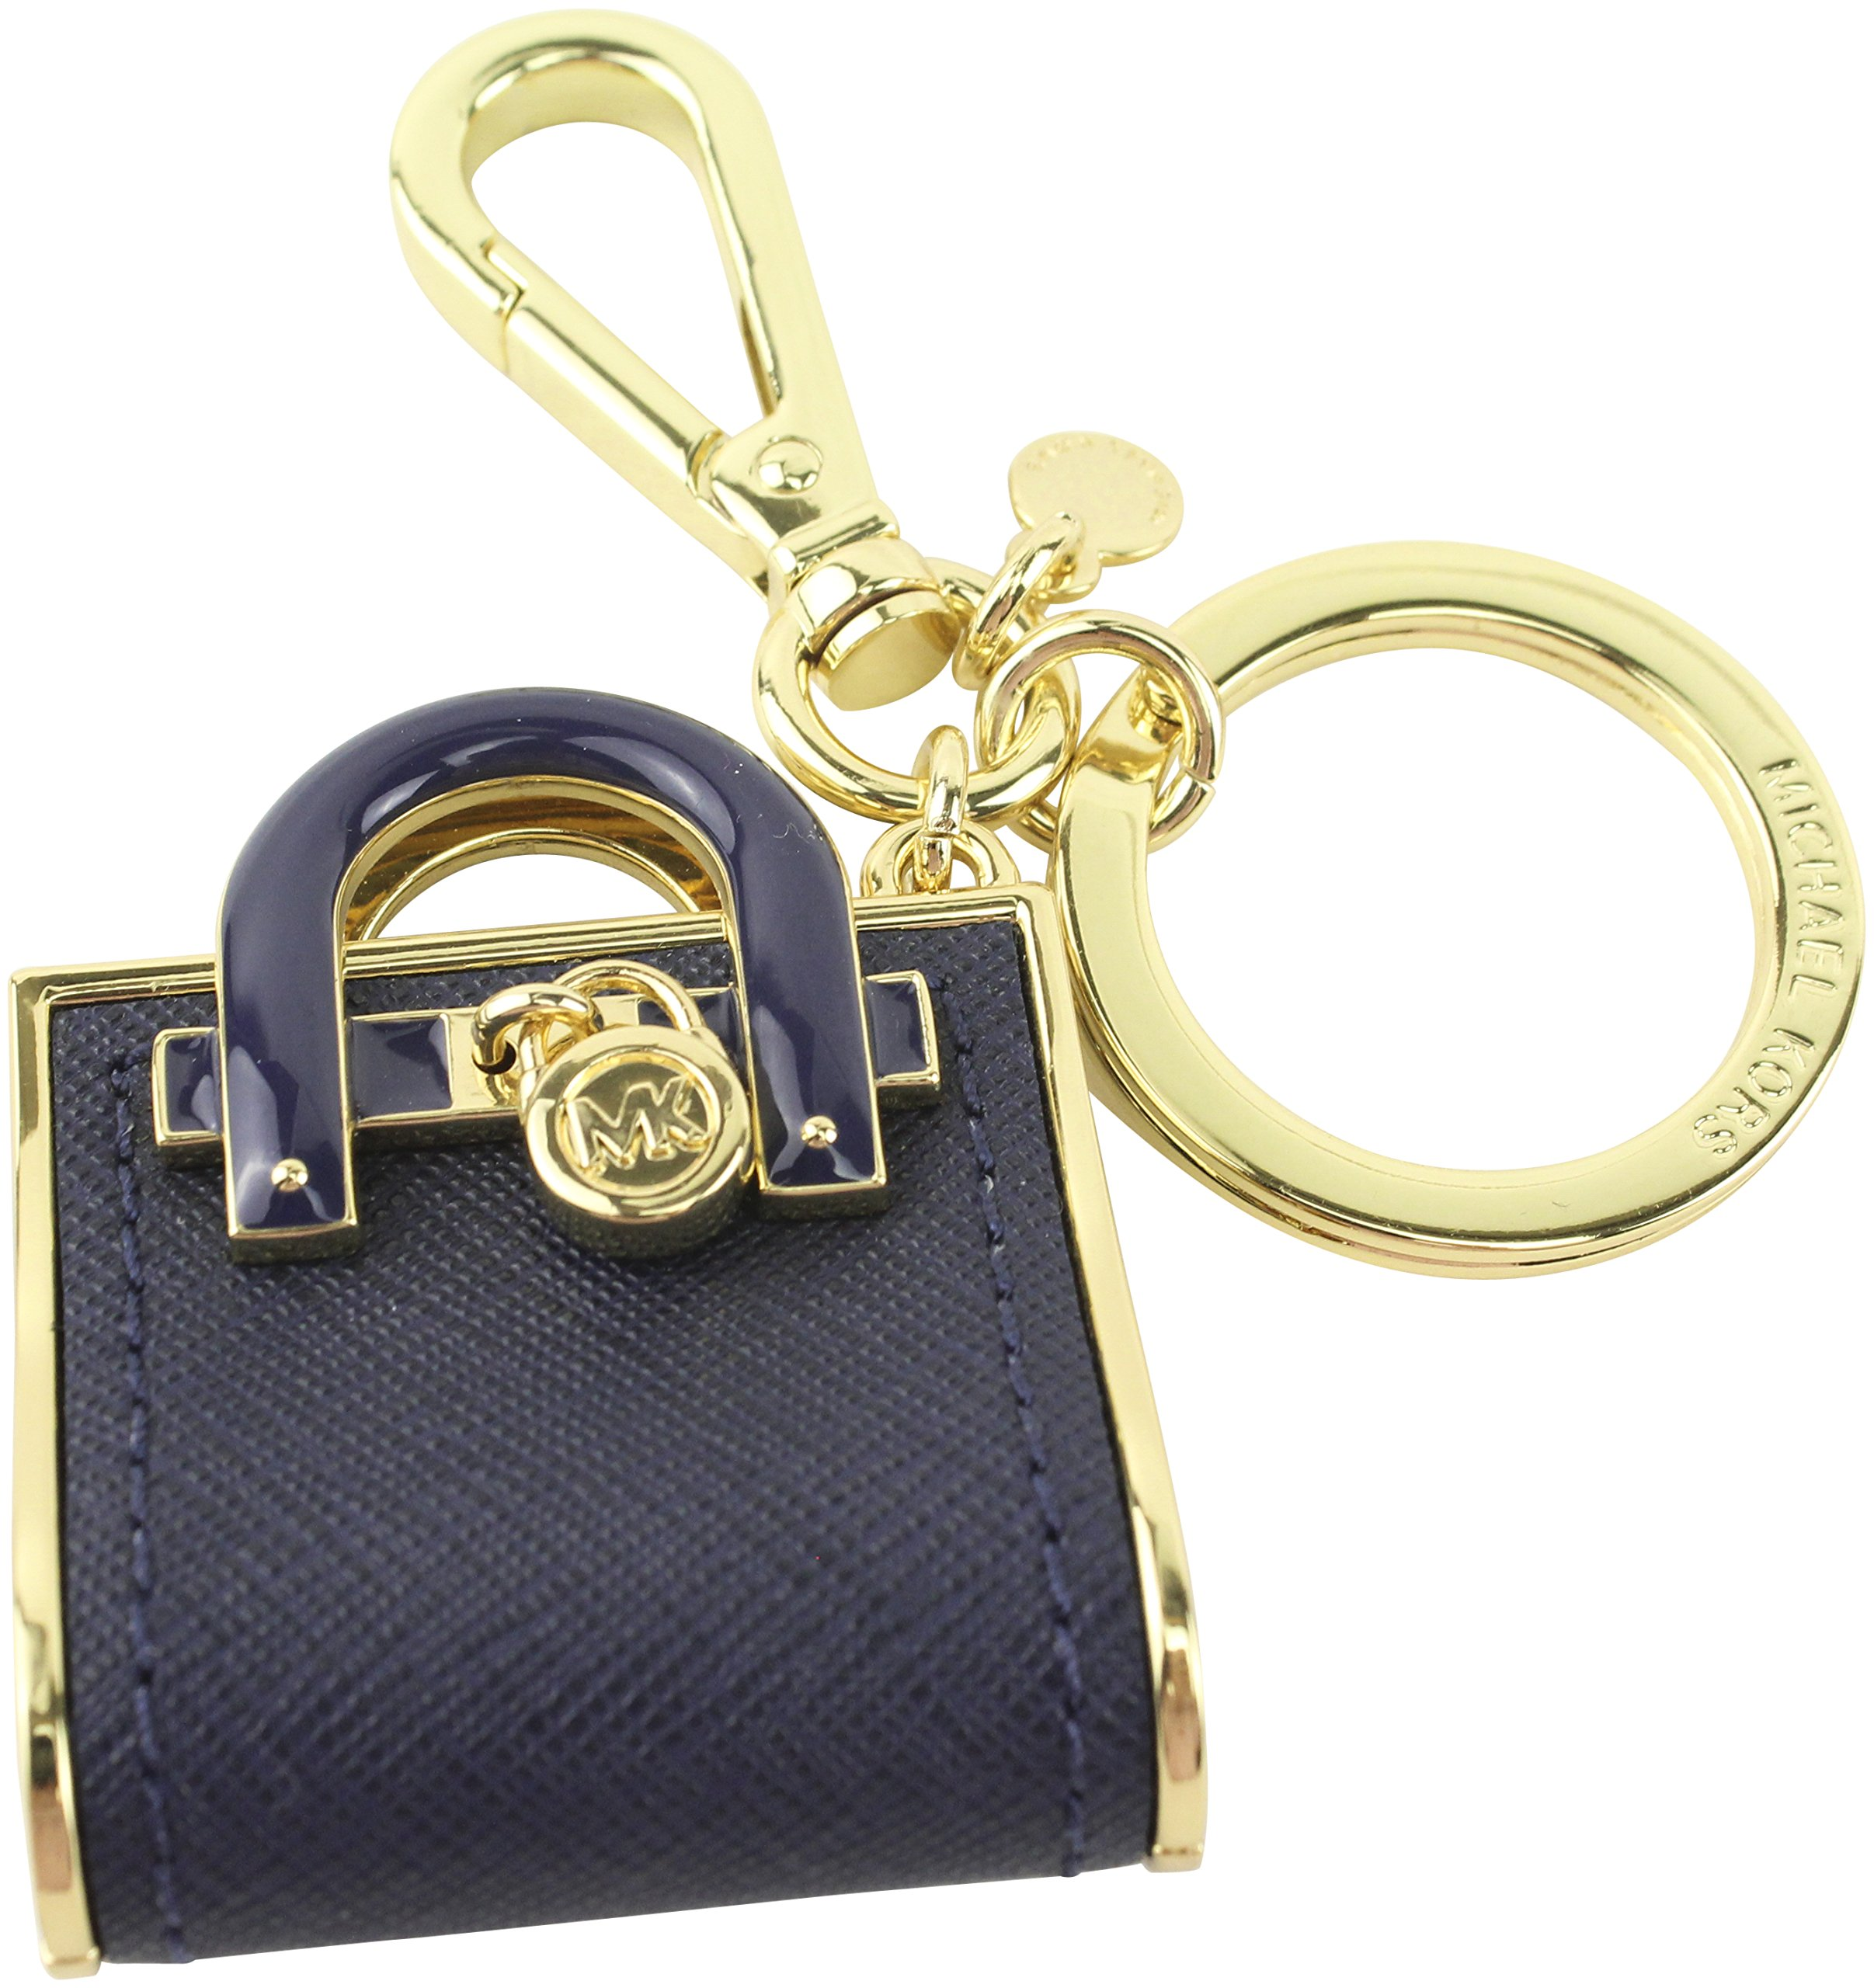 Michael Kors Hamilton Mk Hand Bag Key Charm Fob / Purse Charms Onse Size Navy by Michael Kors